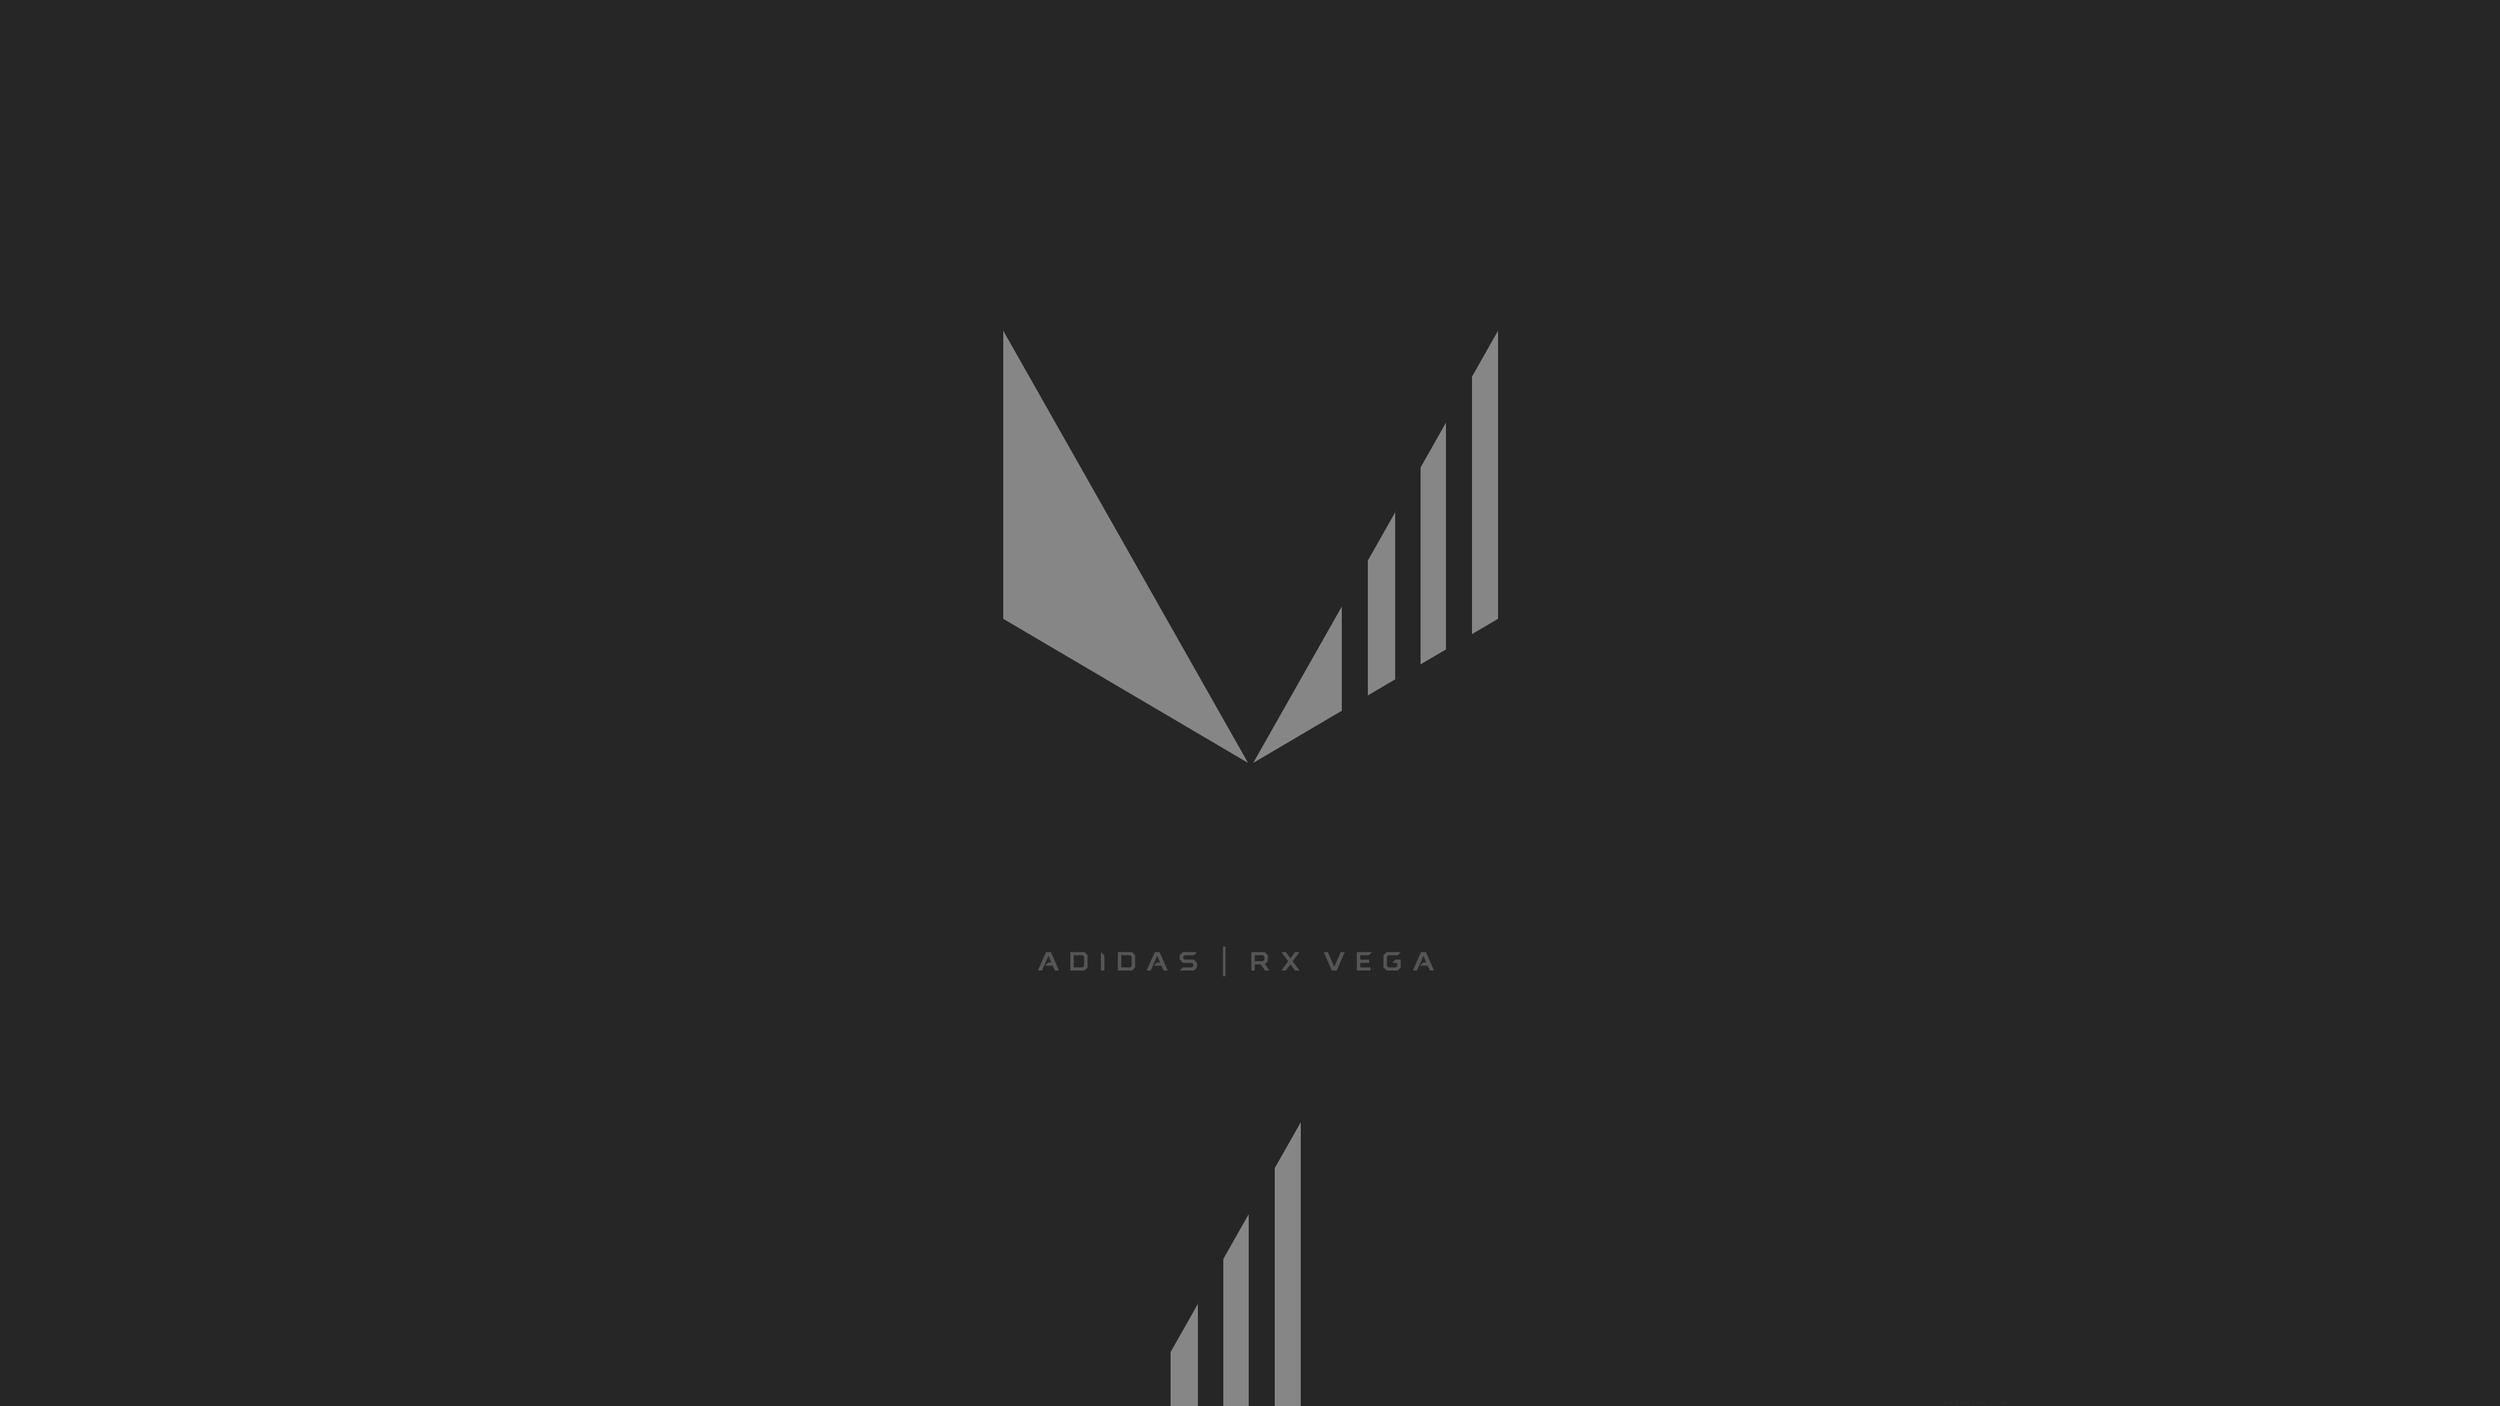 AMD+Adidas+Partnership+RX+Vega+2+II.png